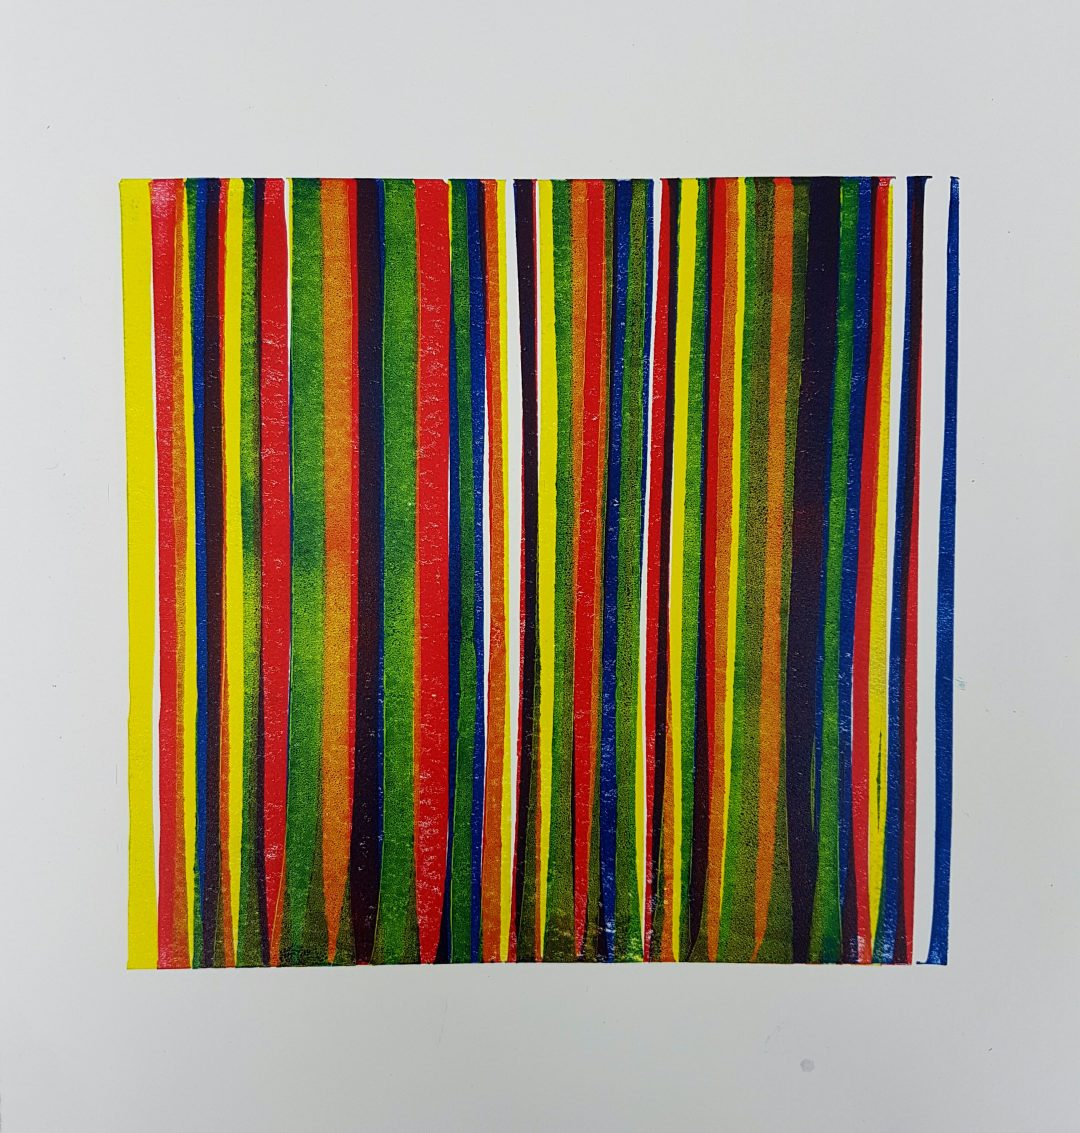 Vinyl Spines